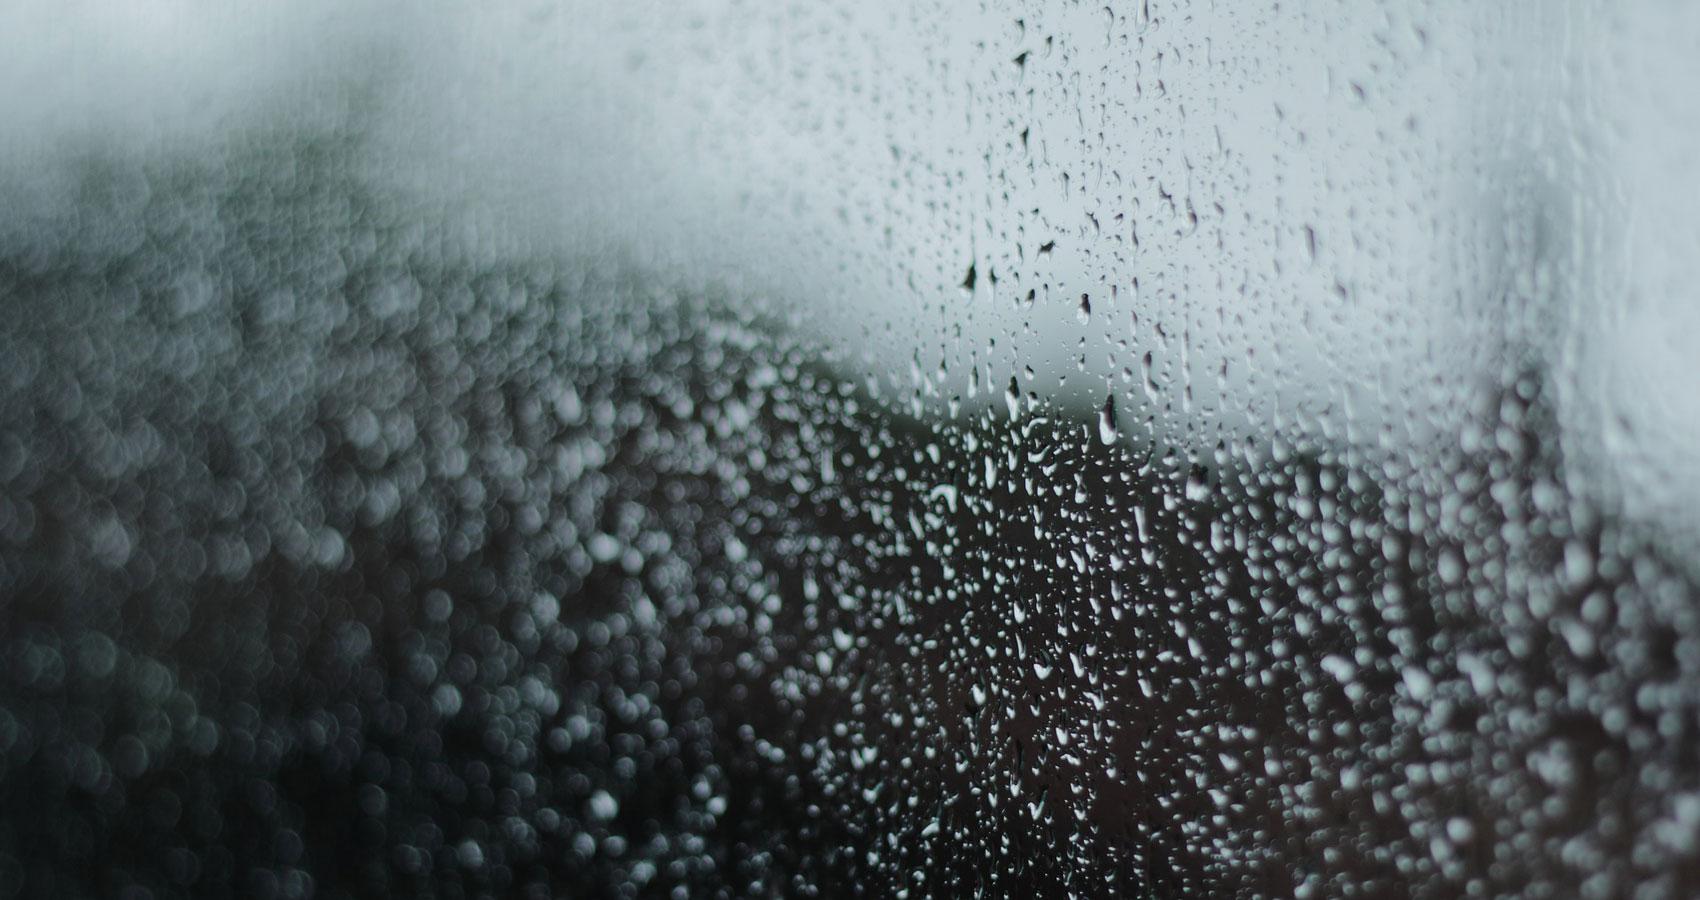 Rain, written by Sue Vanderberg at Spillwords.com